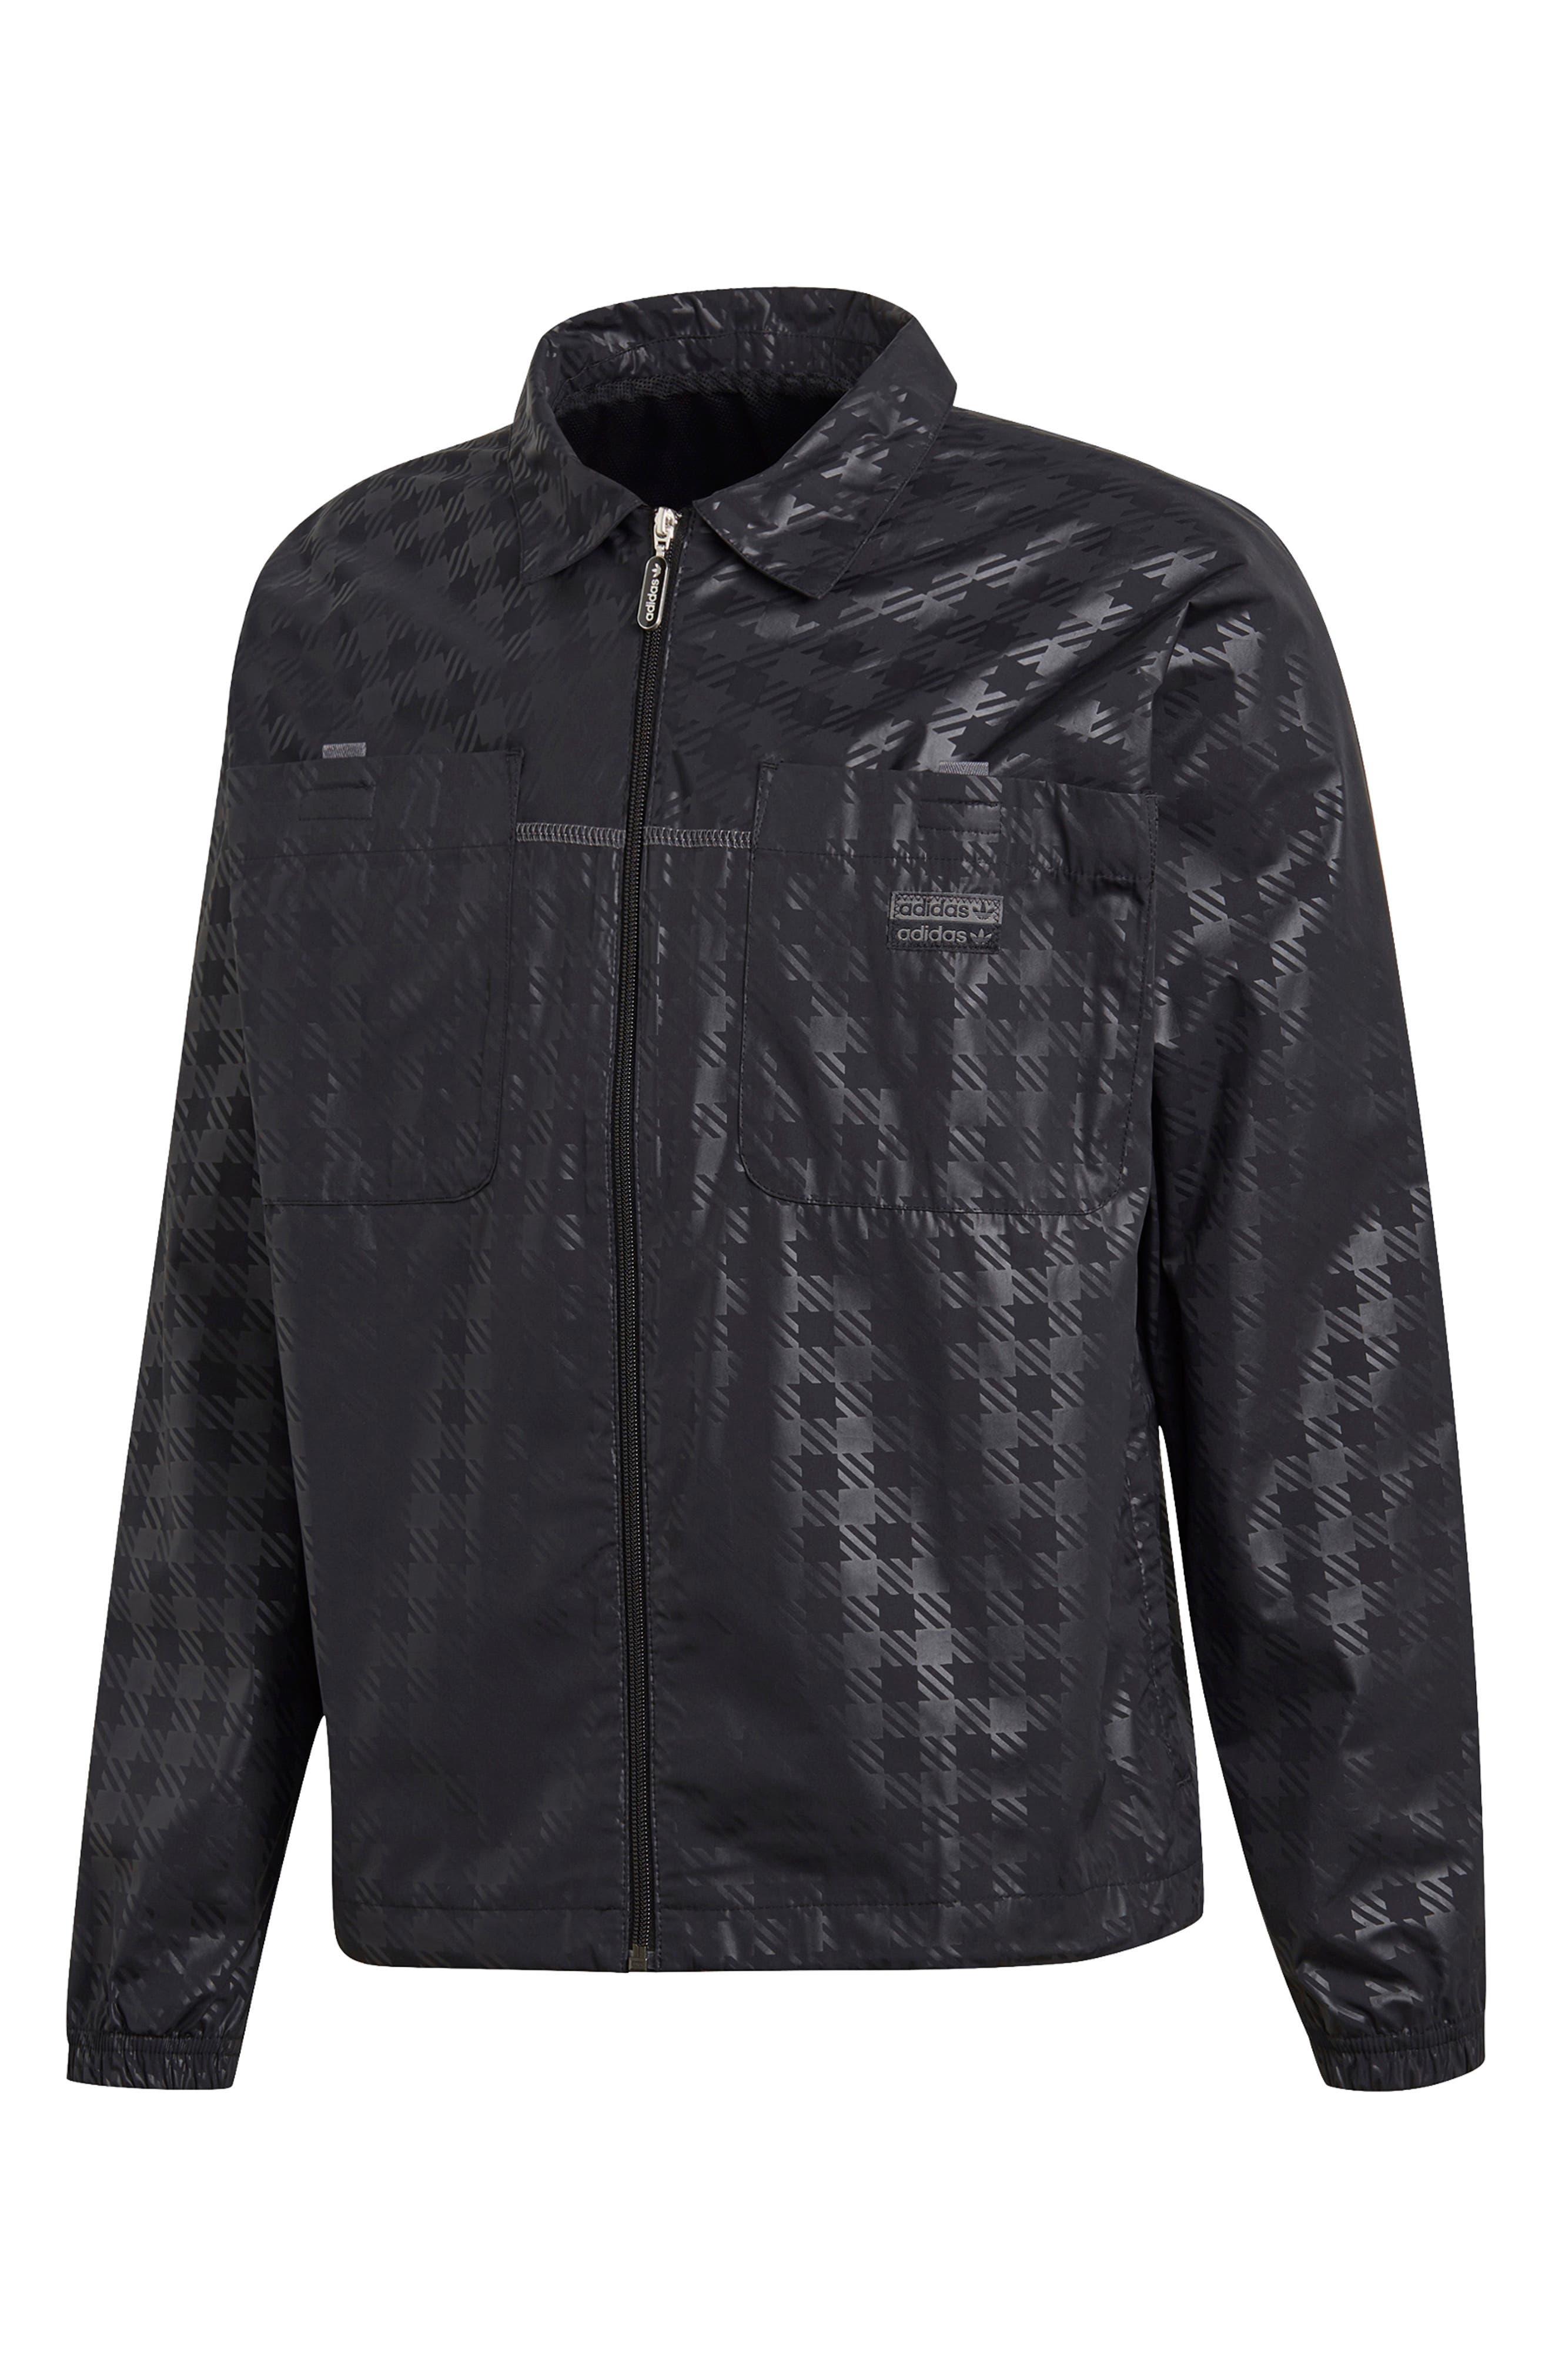 Image of ADIDAS ORIGINALS W Jacket